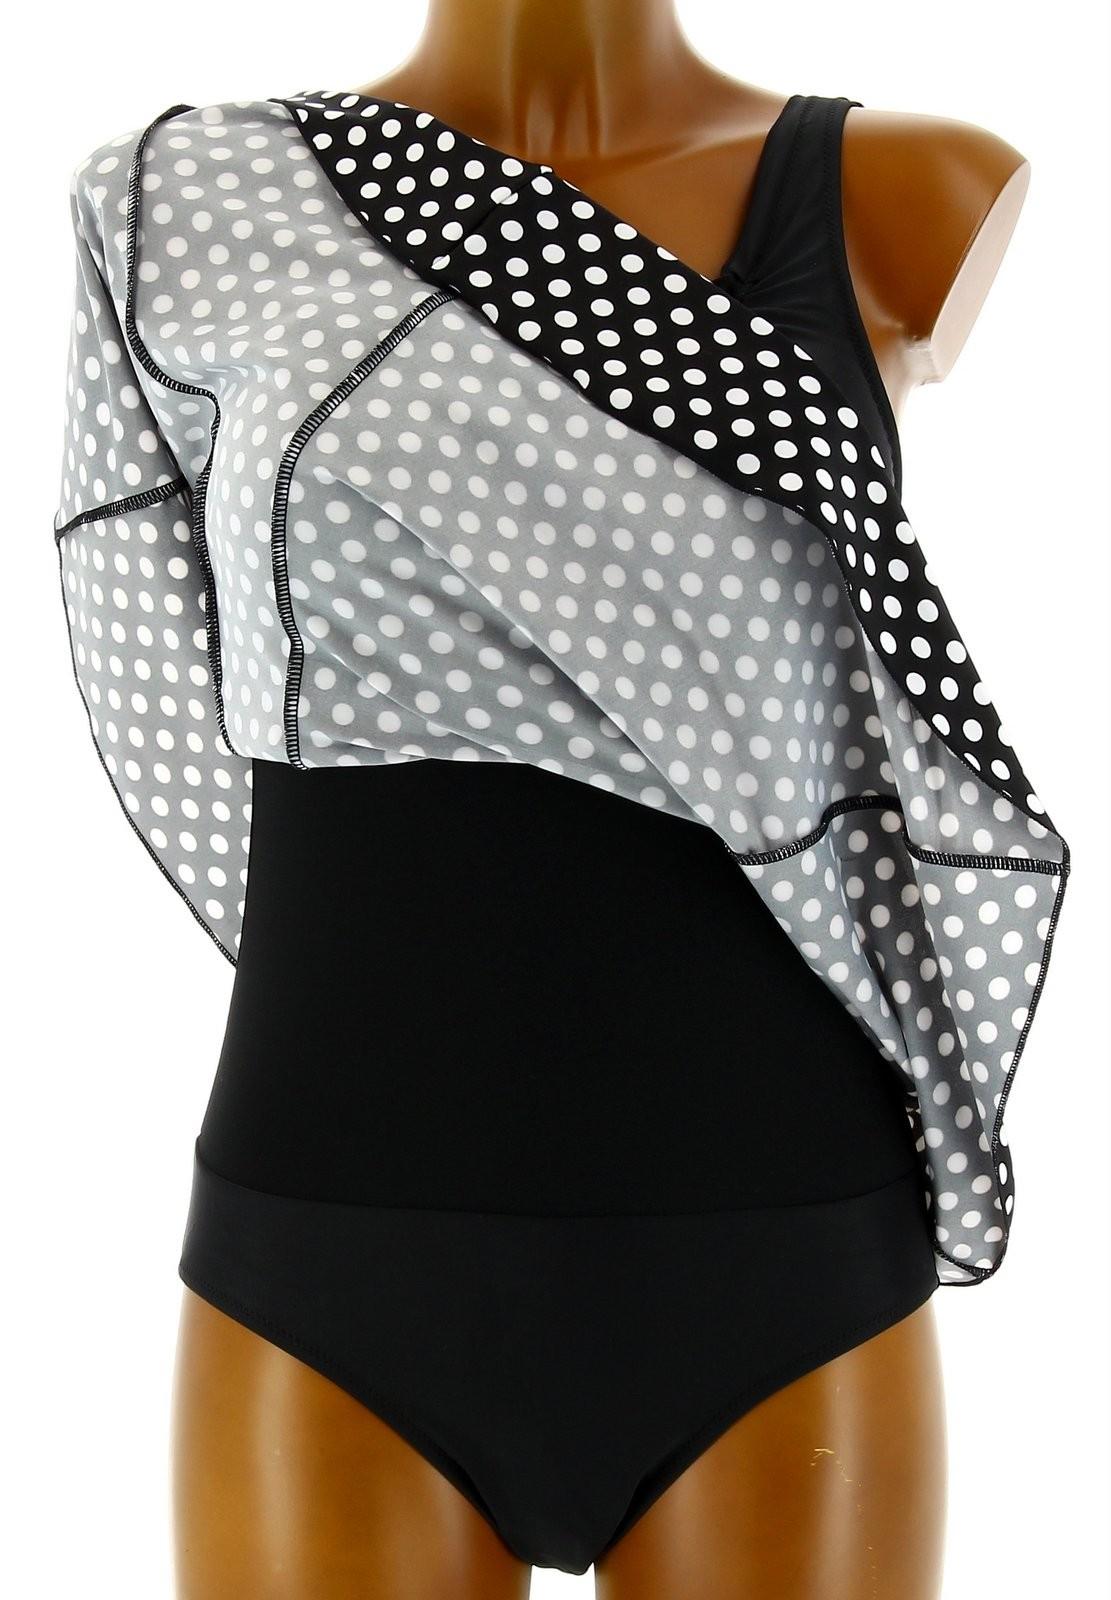 maillot de bain 1 pi ce robe jupette femme lyly. Black Bedroom Furniture Sets. Home Design Ideas